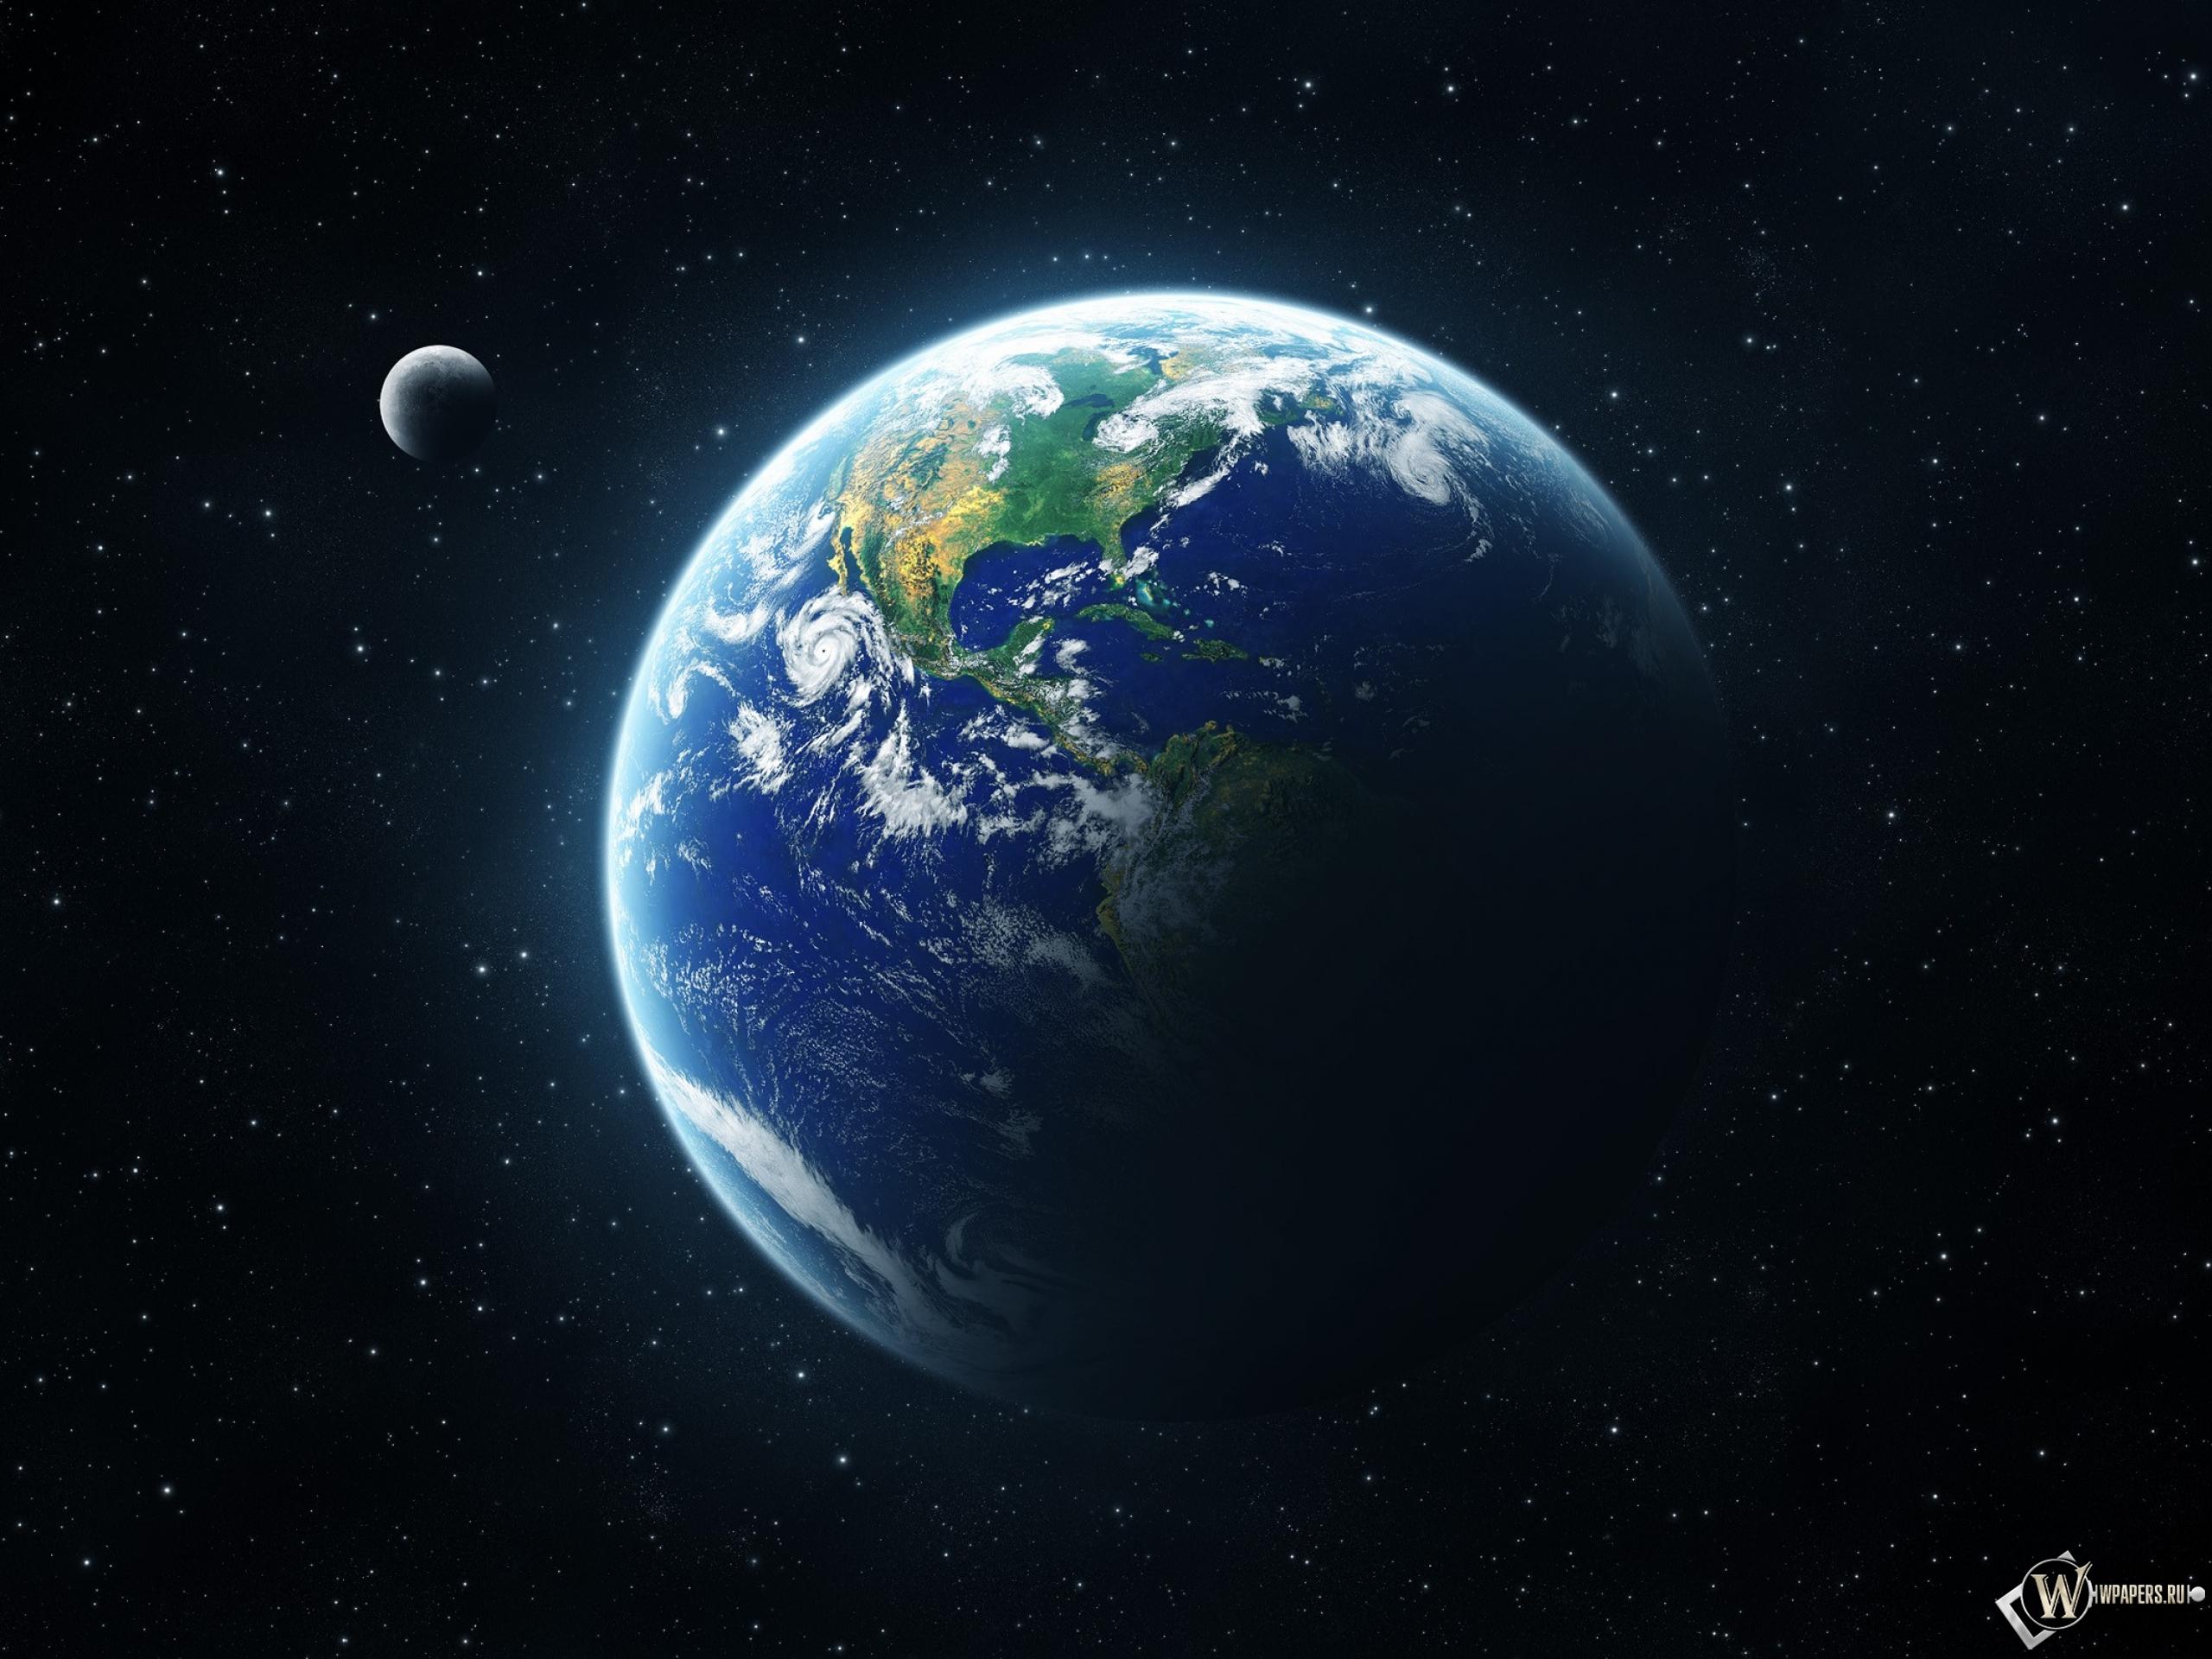 Космос обои на рабочий стол 1280х1024 7